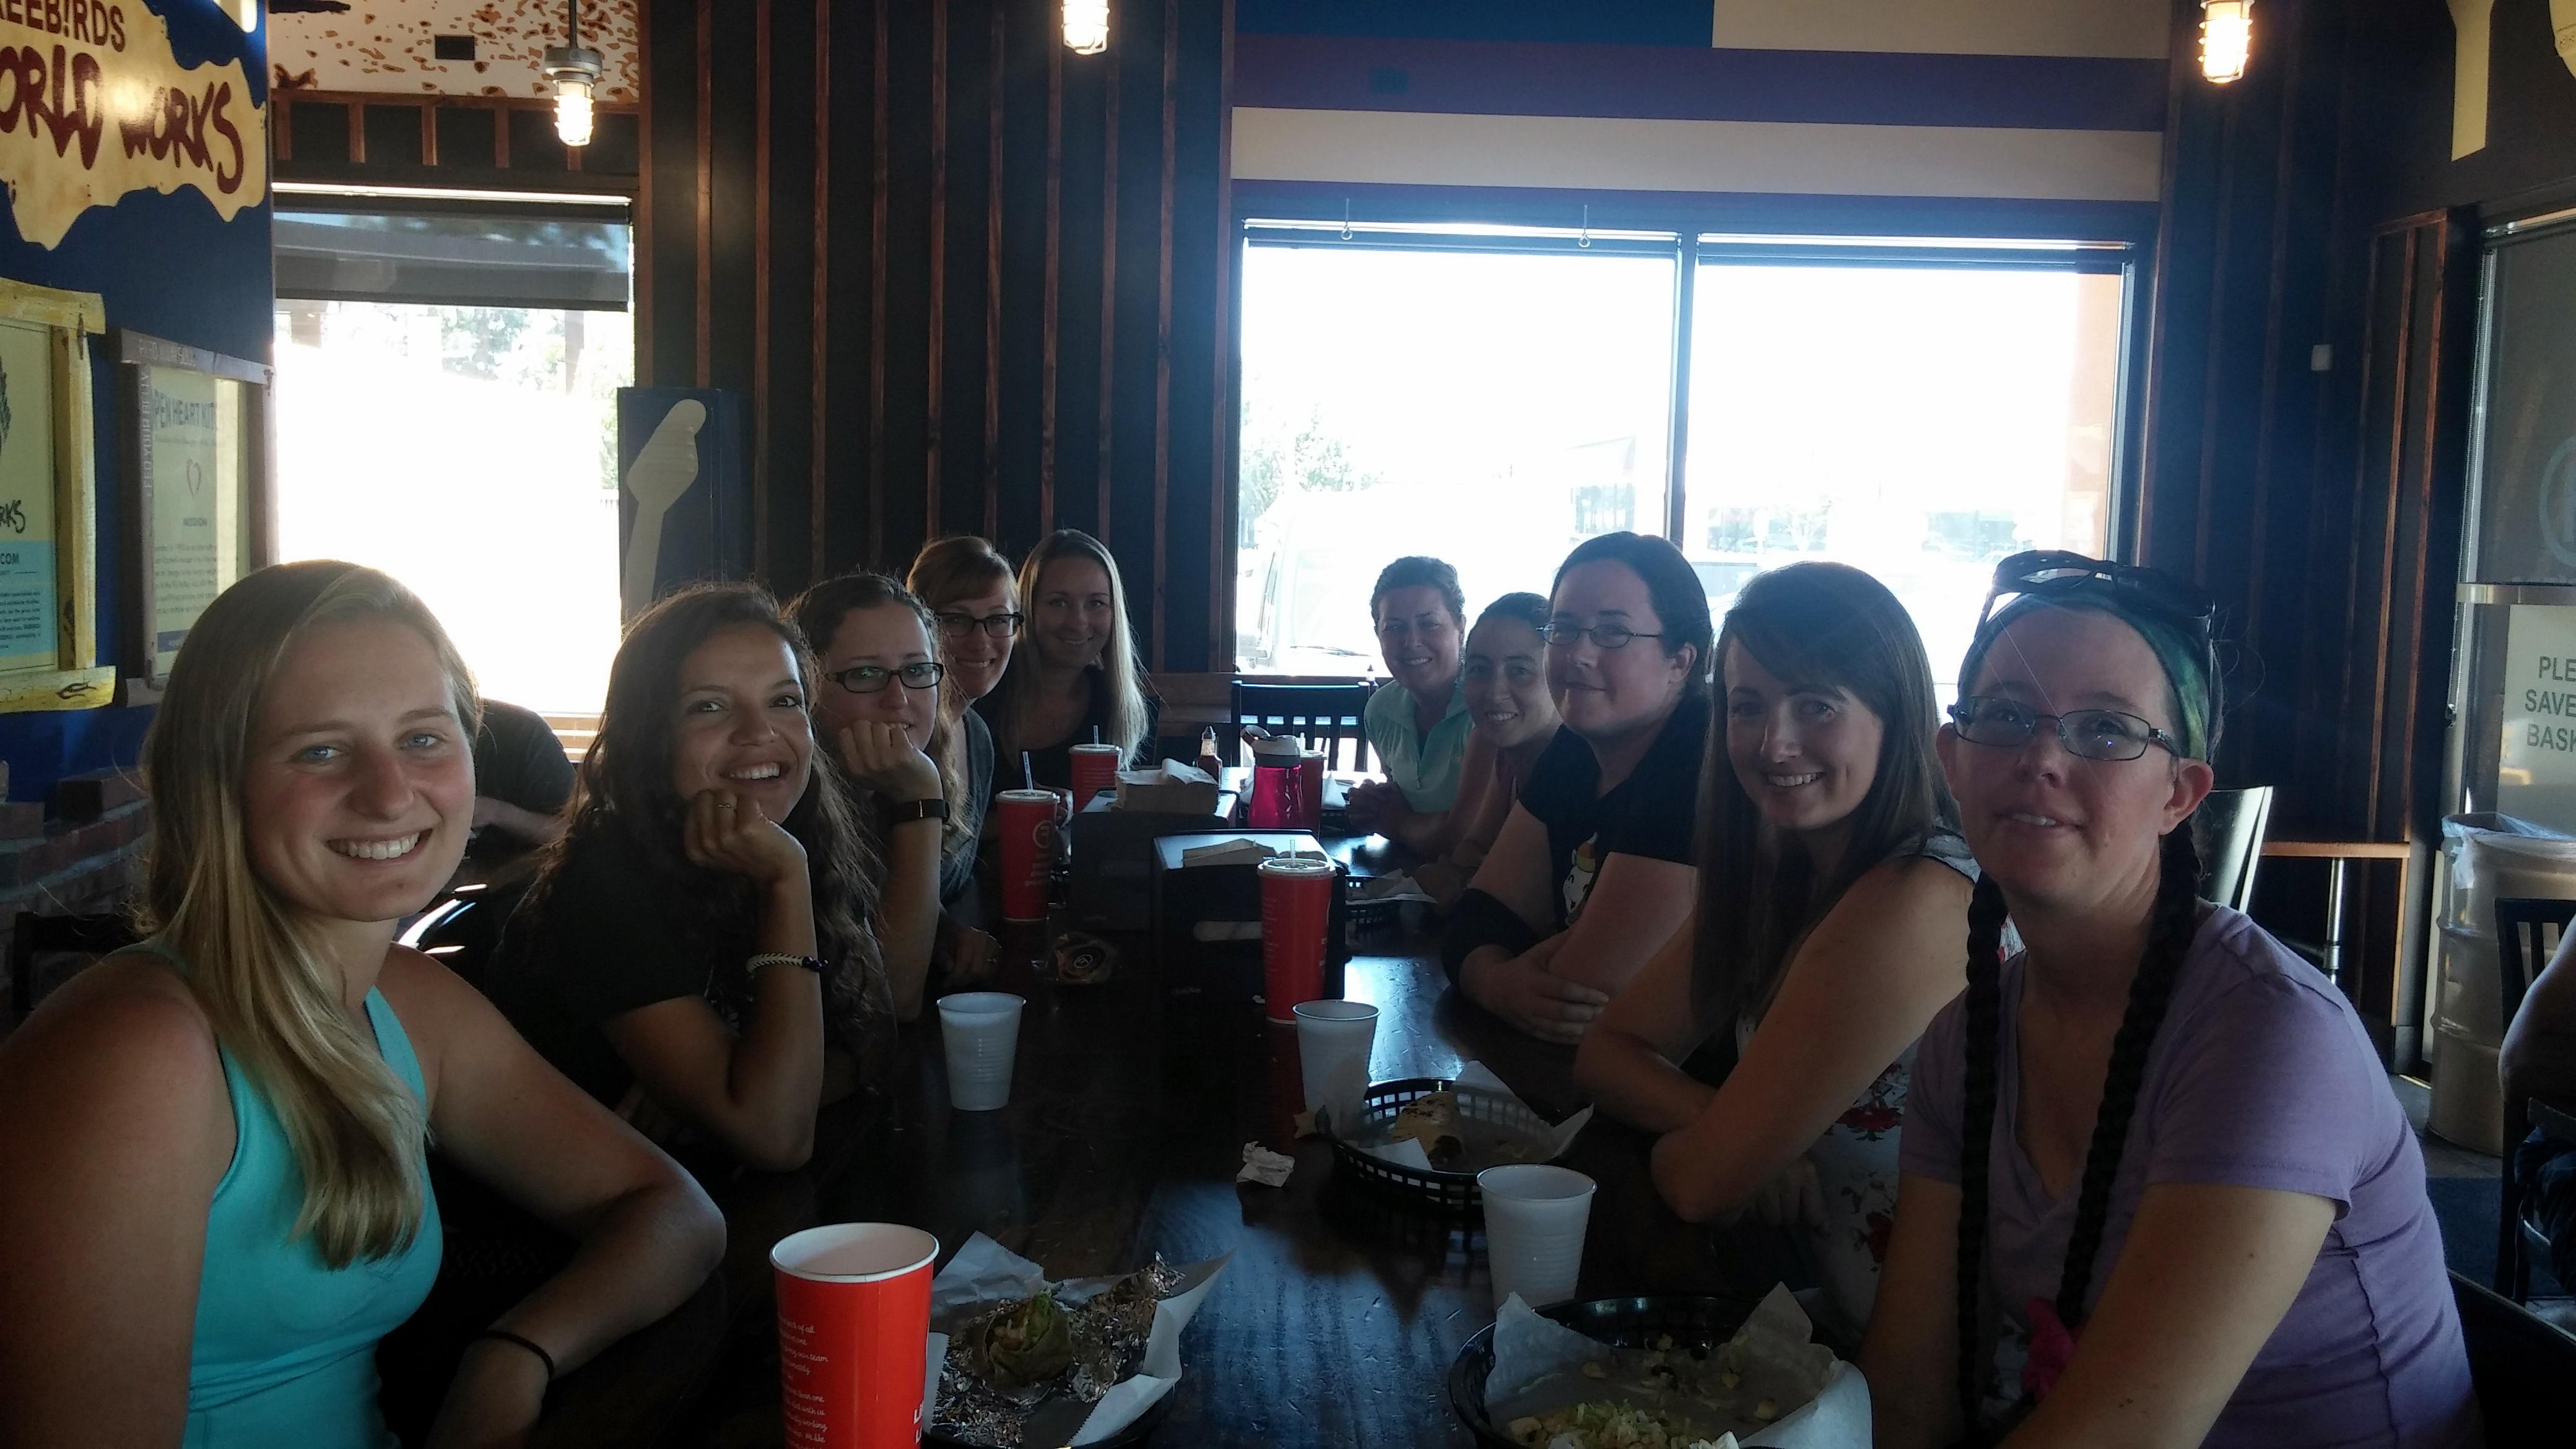 whole group